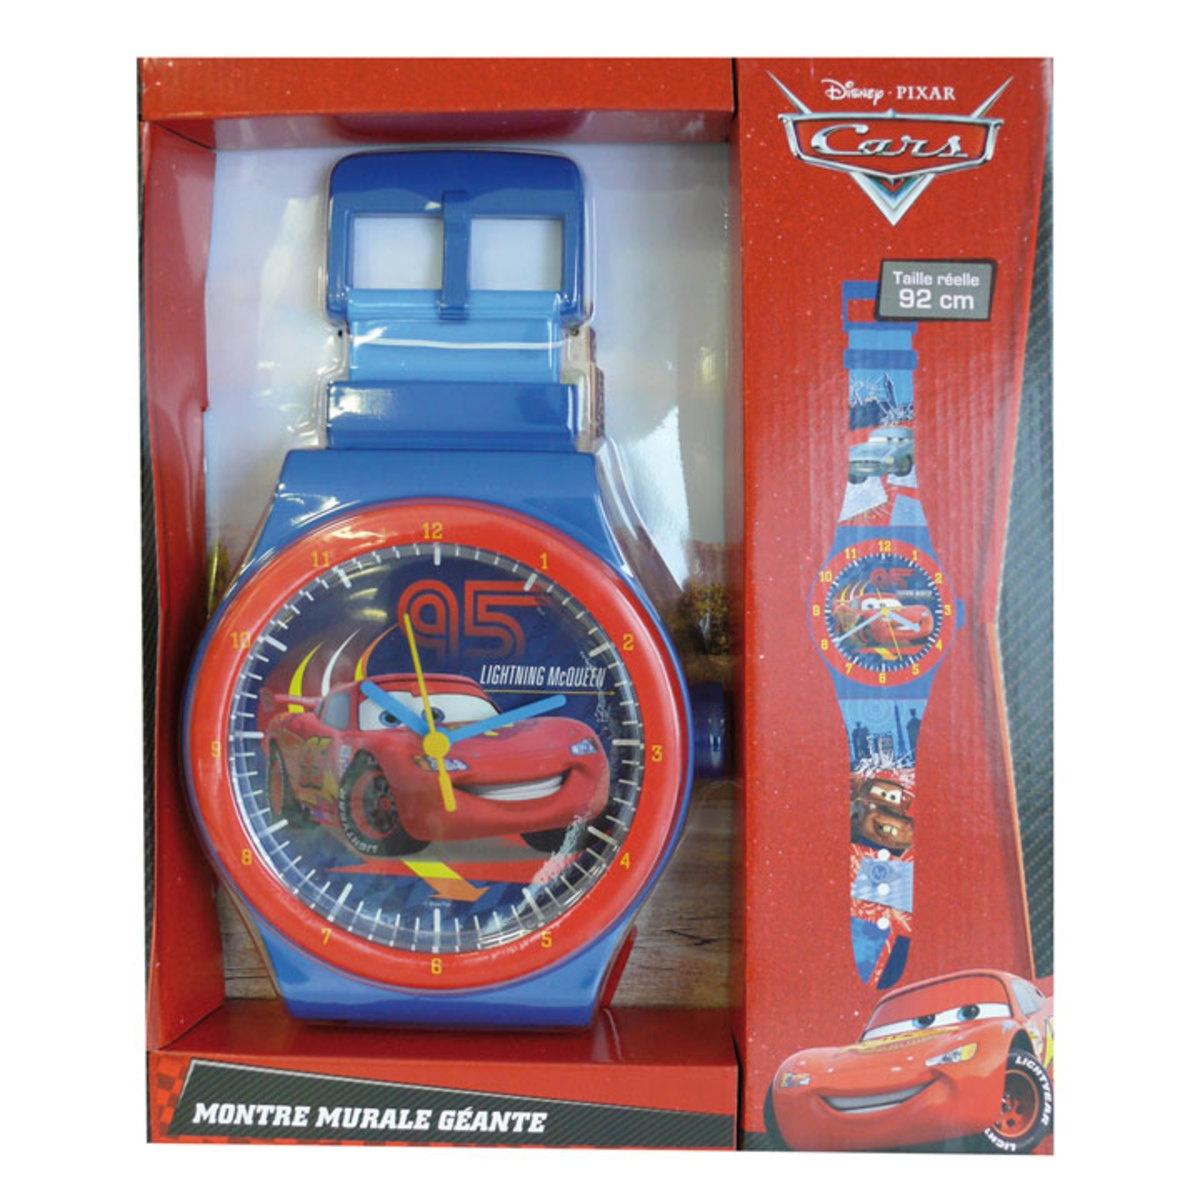 Disney Clock Watch Blue Cars Internet Toys